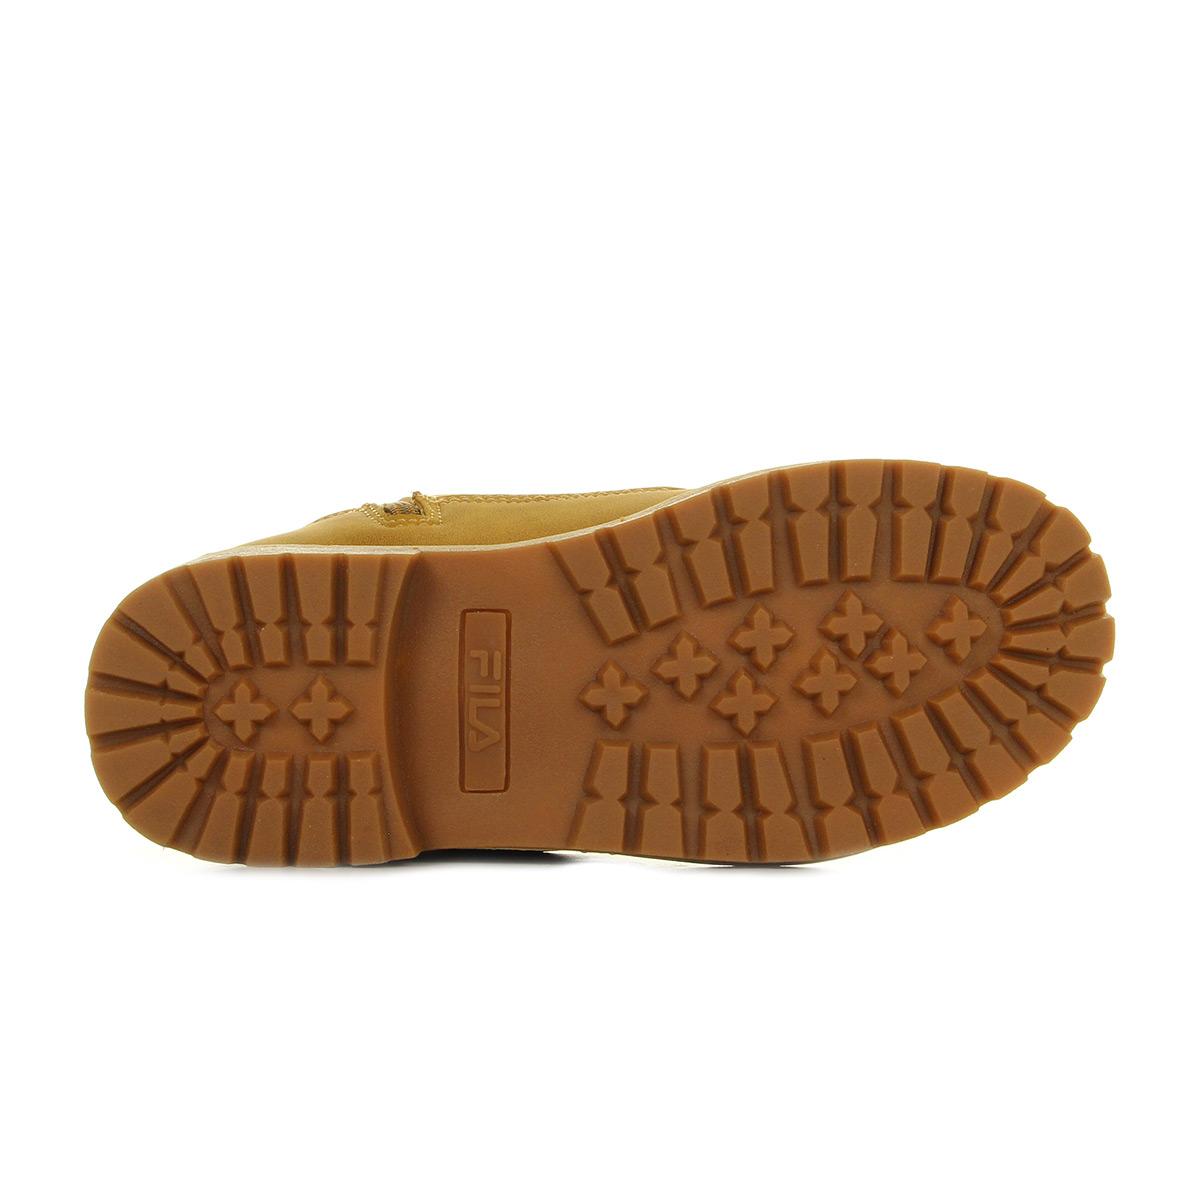 Chipmunk Maverick Boots Chaussures Jr Mid Fila Marron Garçon